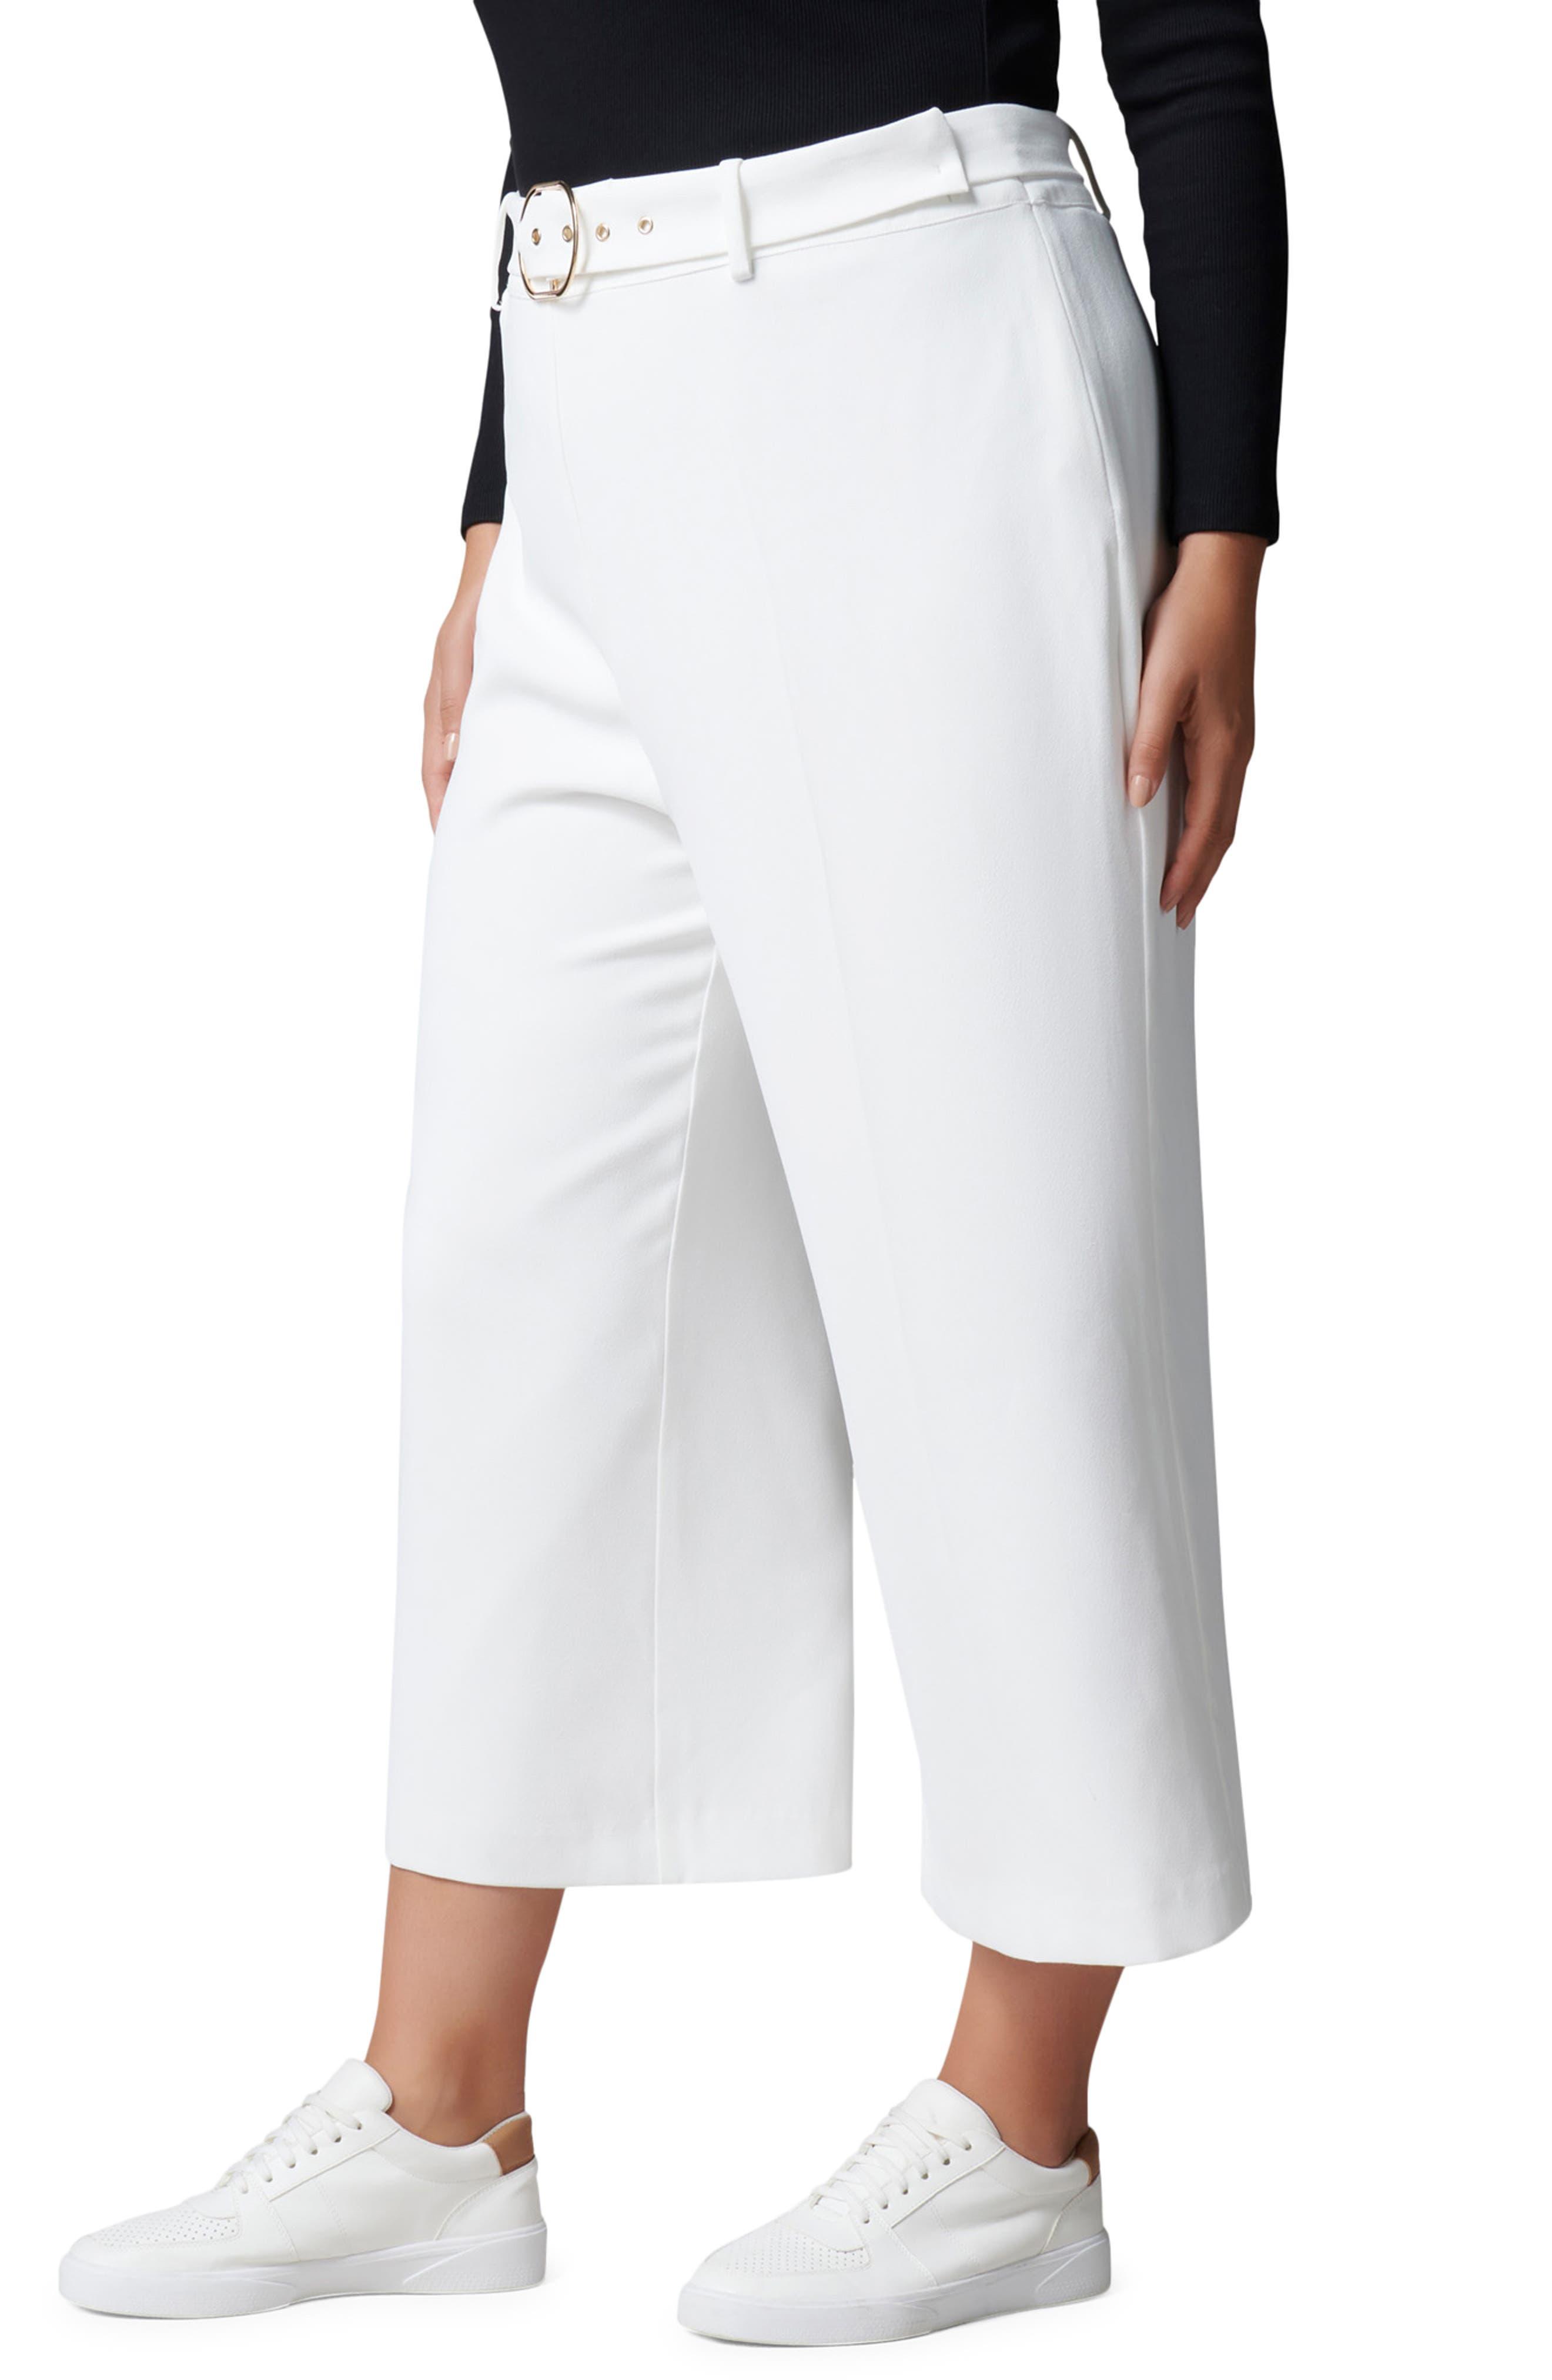 Biance Belted Crop Wide Leg Pants